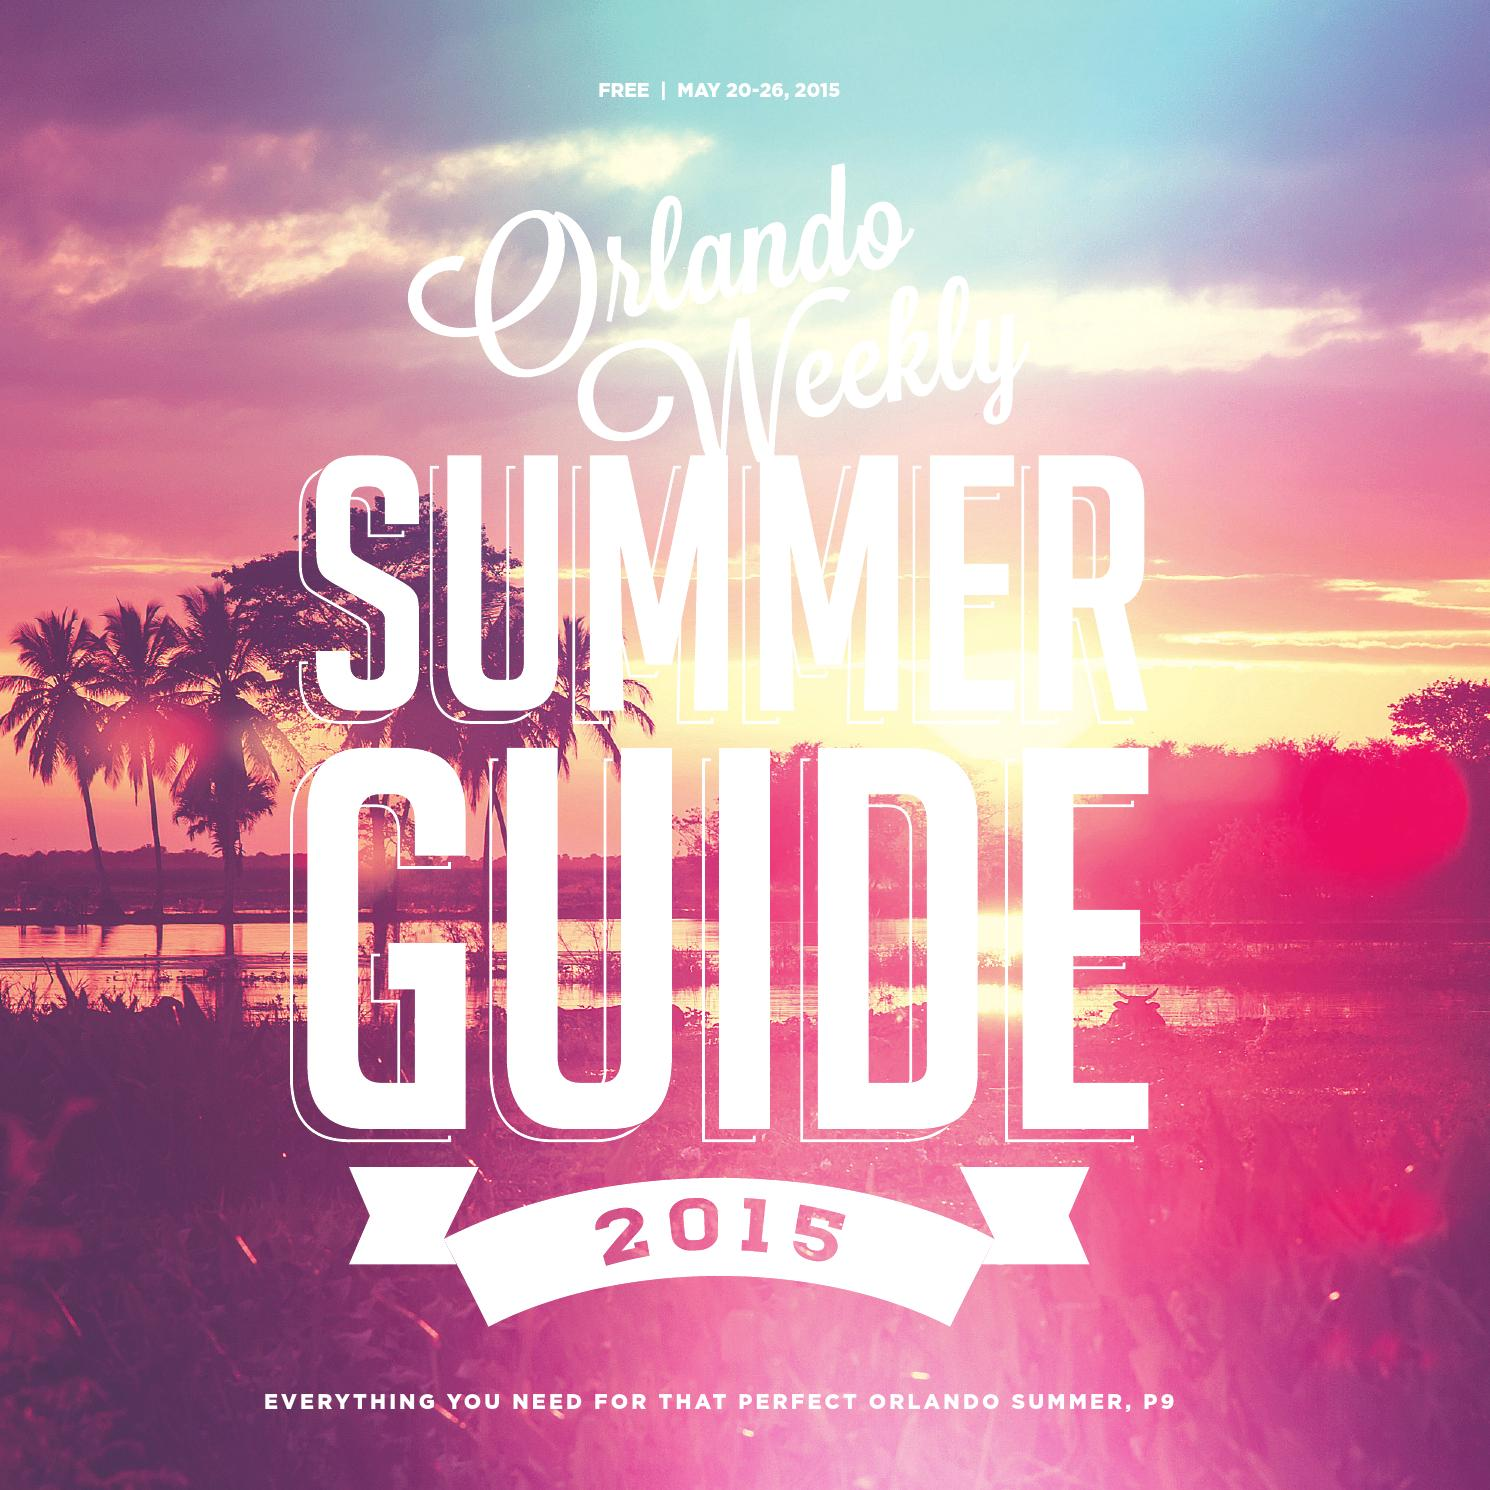 Orlando Weekly May 20 2015 By Euclid Media Group Issuu